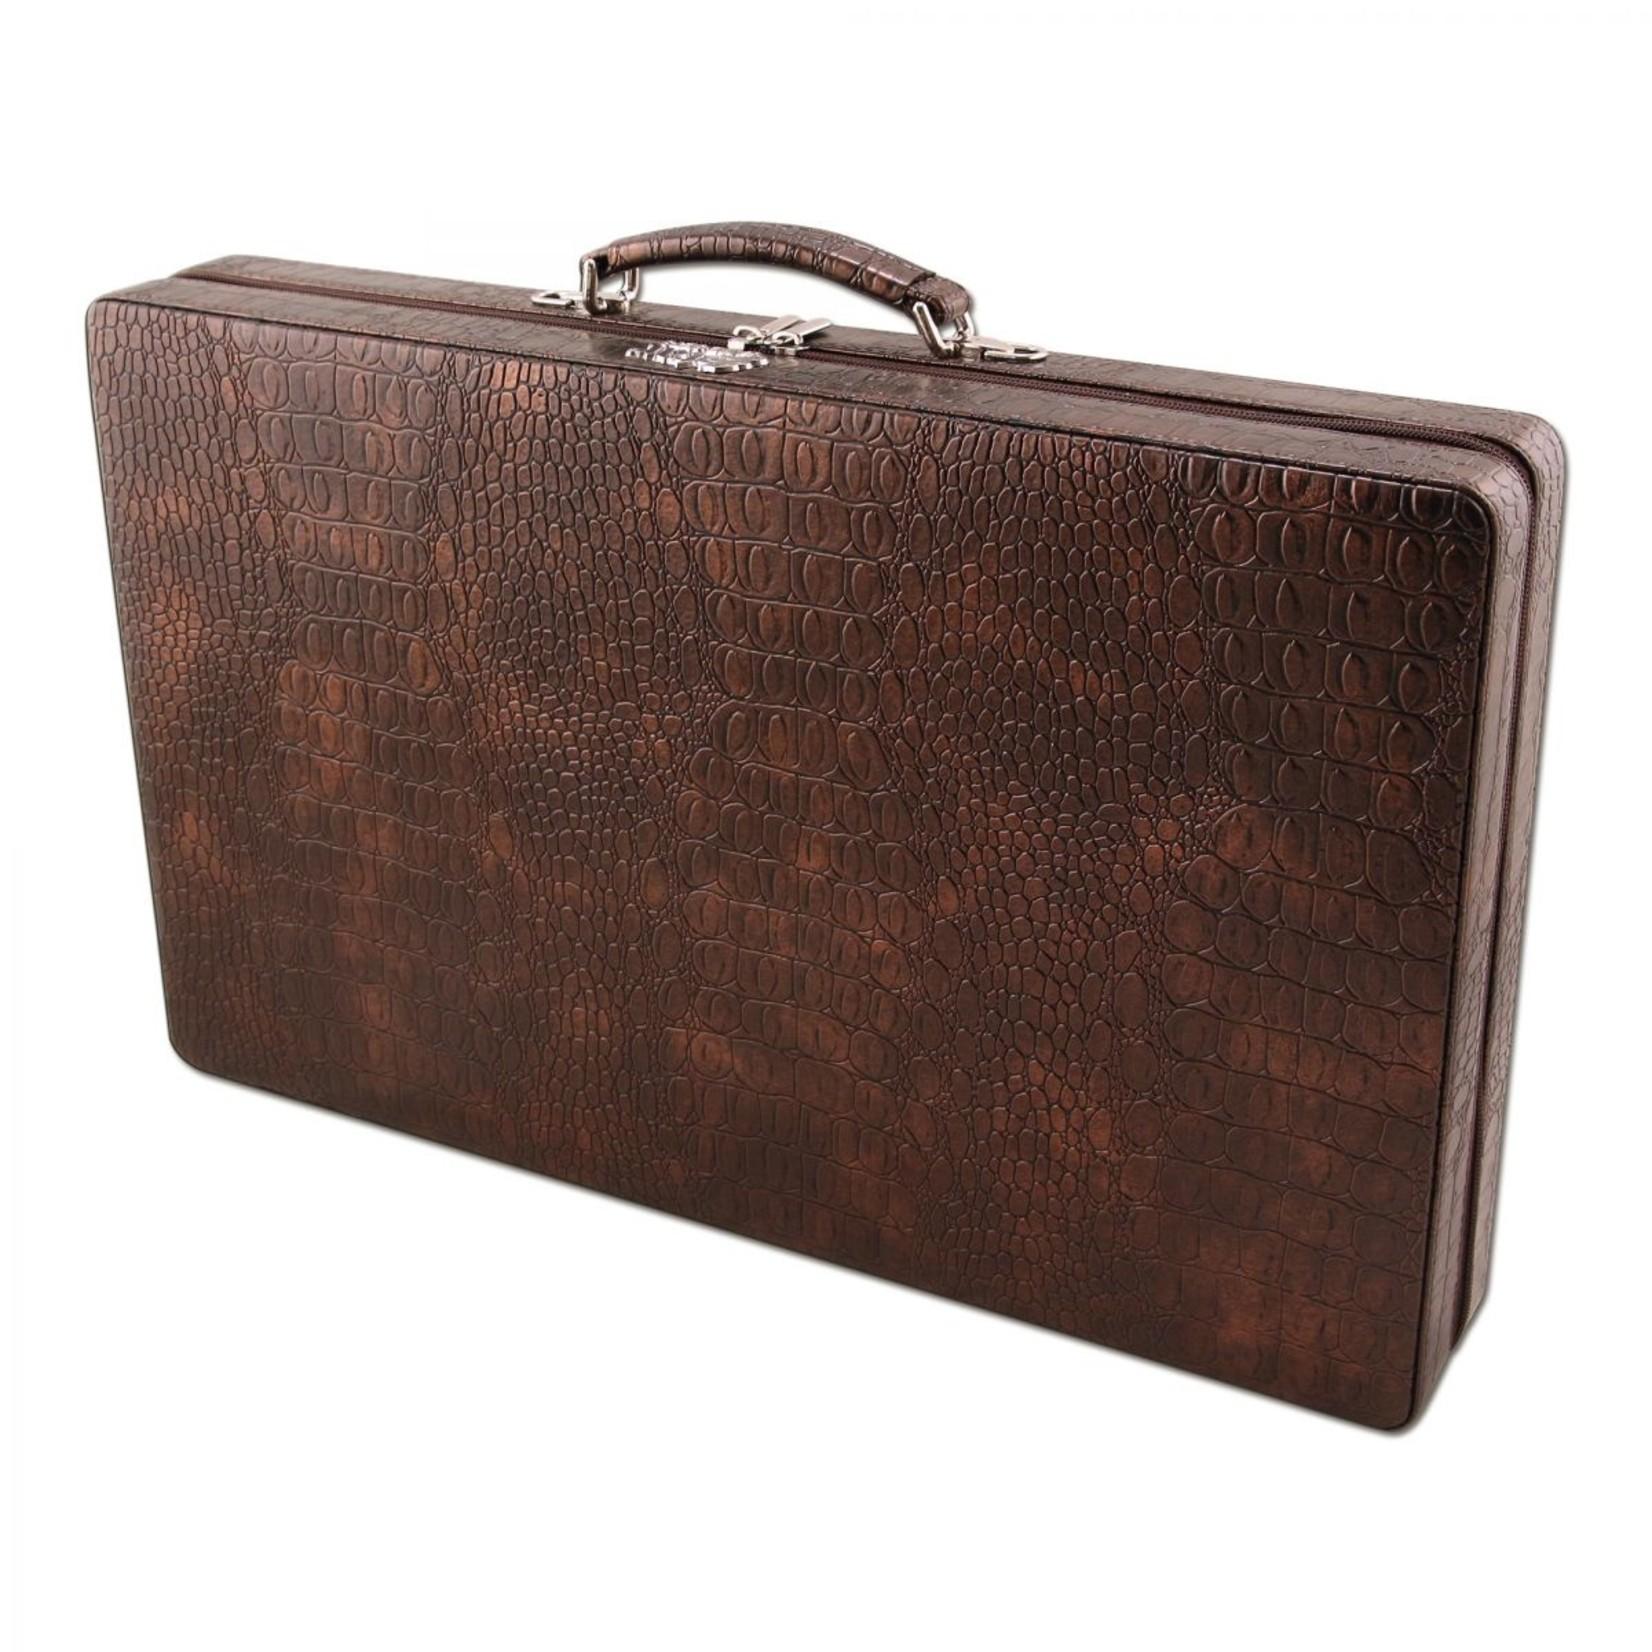 Backgammon koffer - Rits